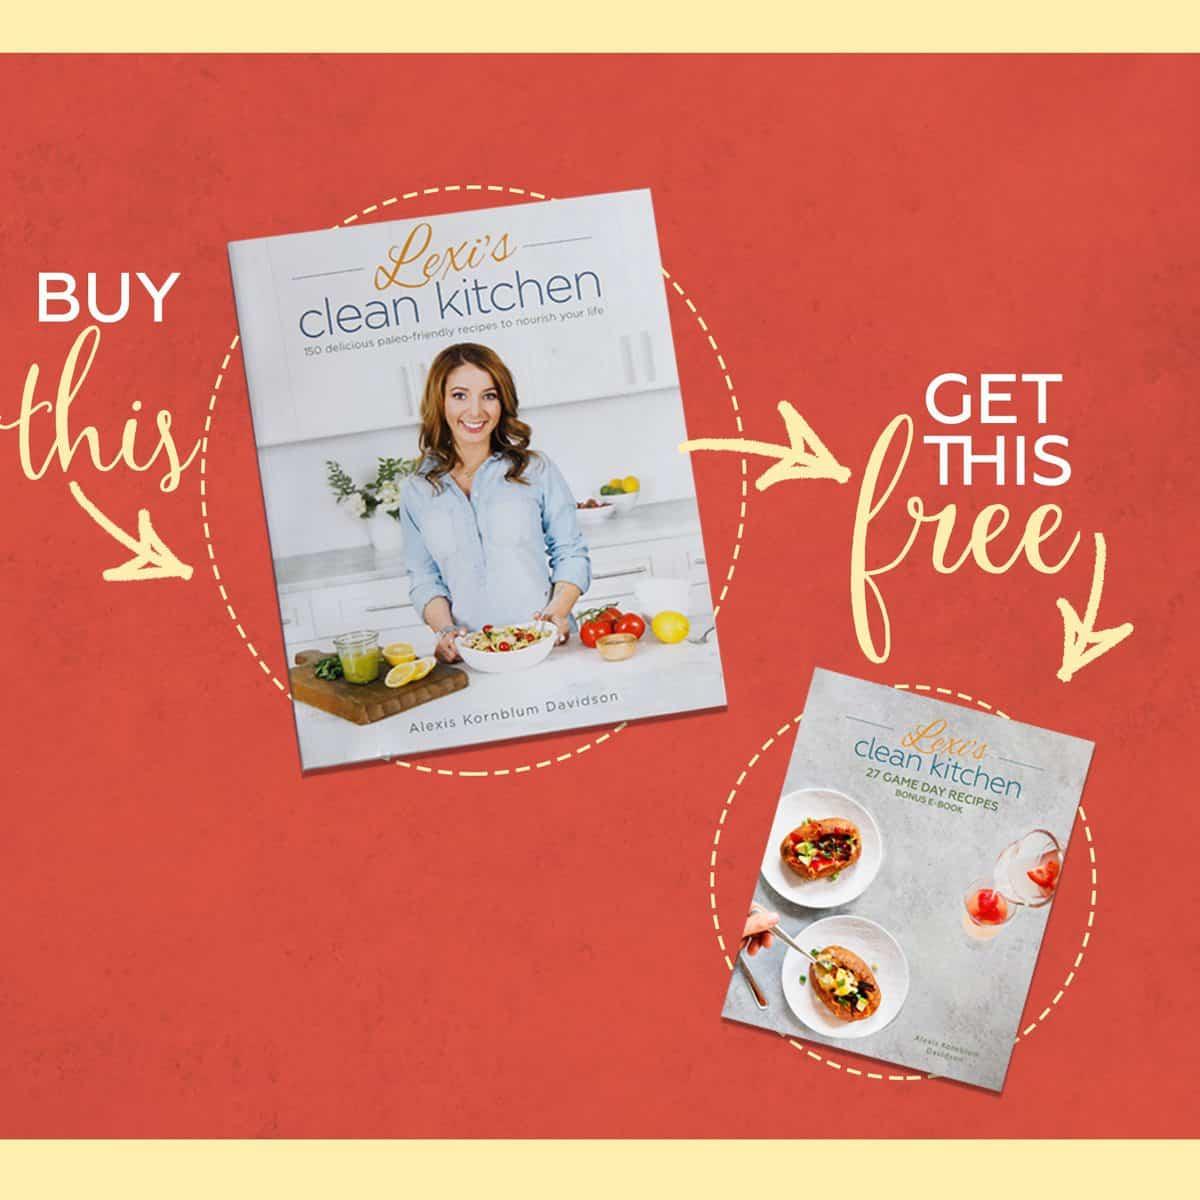 Lexi's Clean Kitchen: Get Your FREE 27 Recipe Bonus E-Book